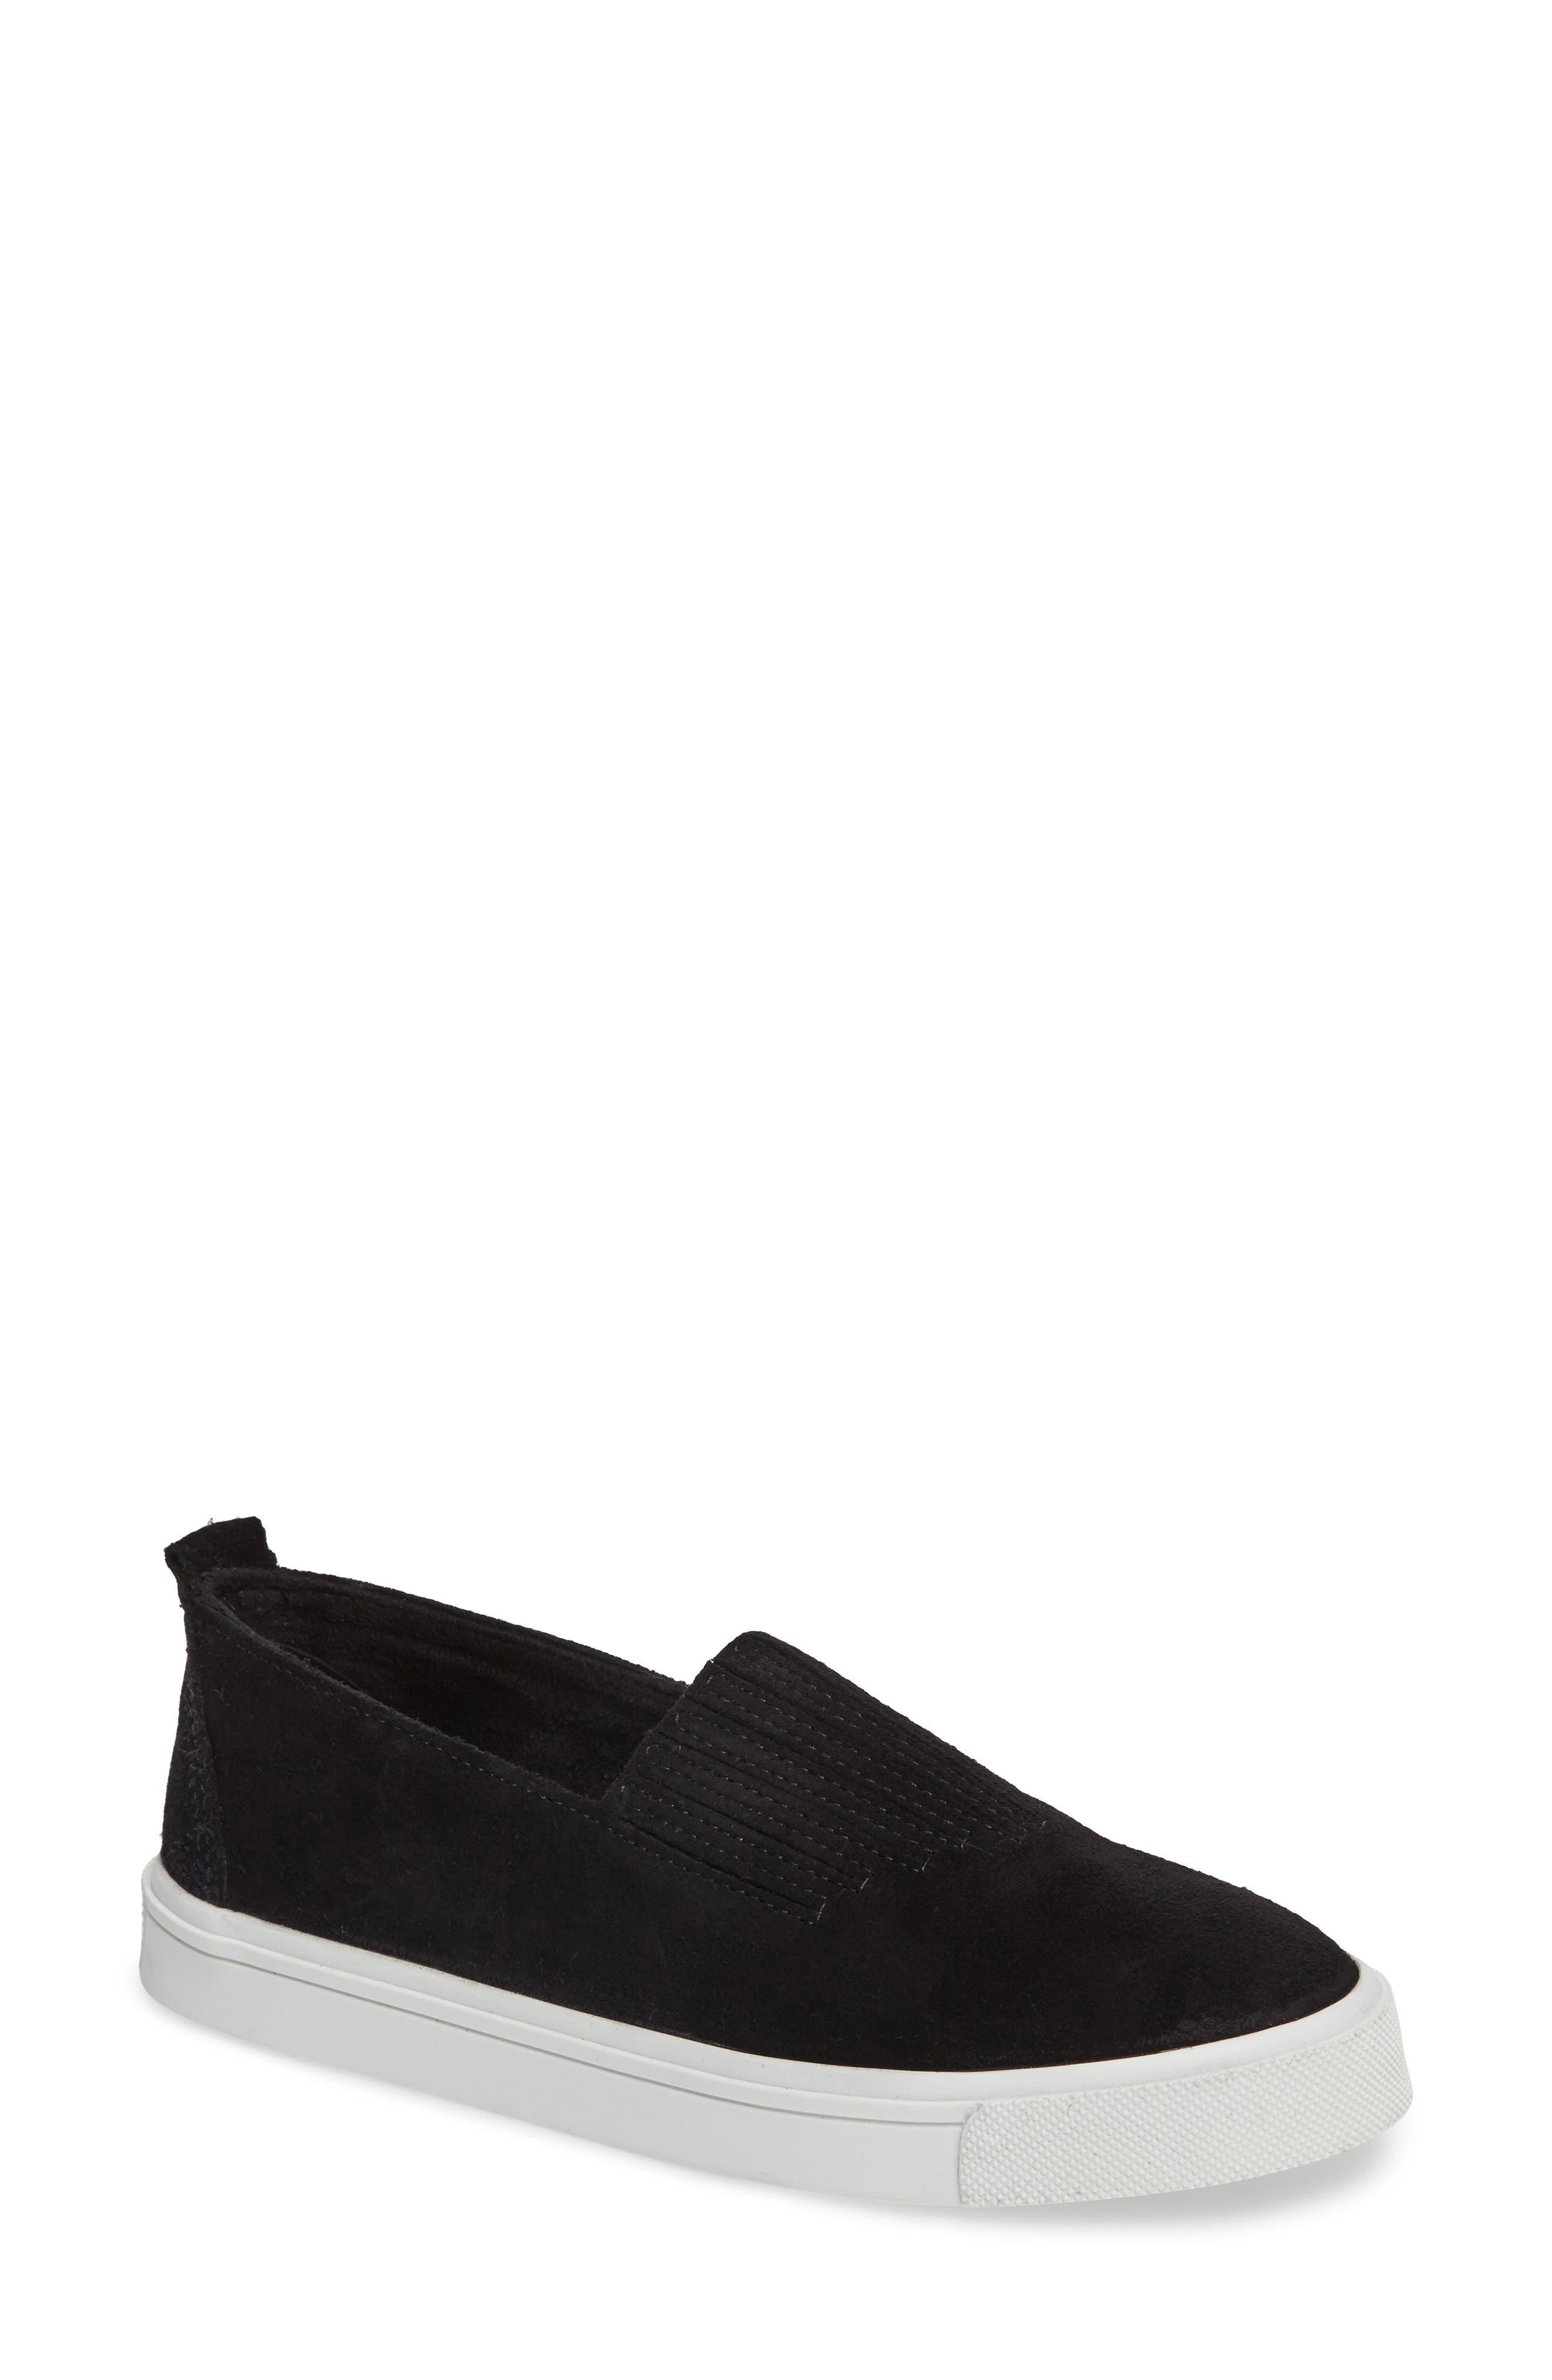 MINNETONKA, Gabi Slip-On Sneaker, Main thumbnail 1, color, BLACK